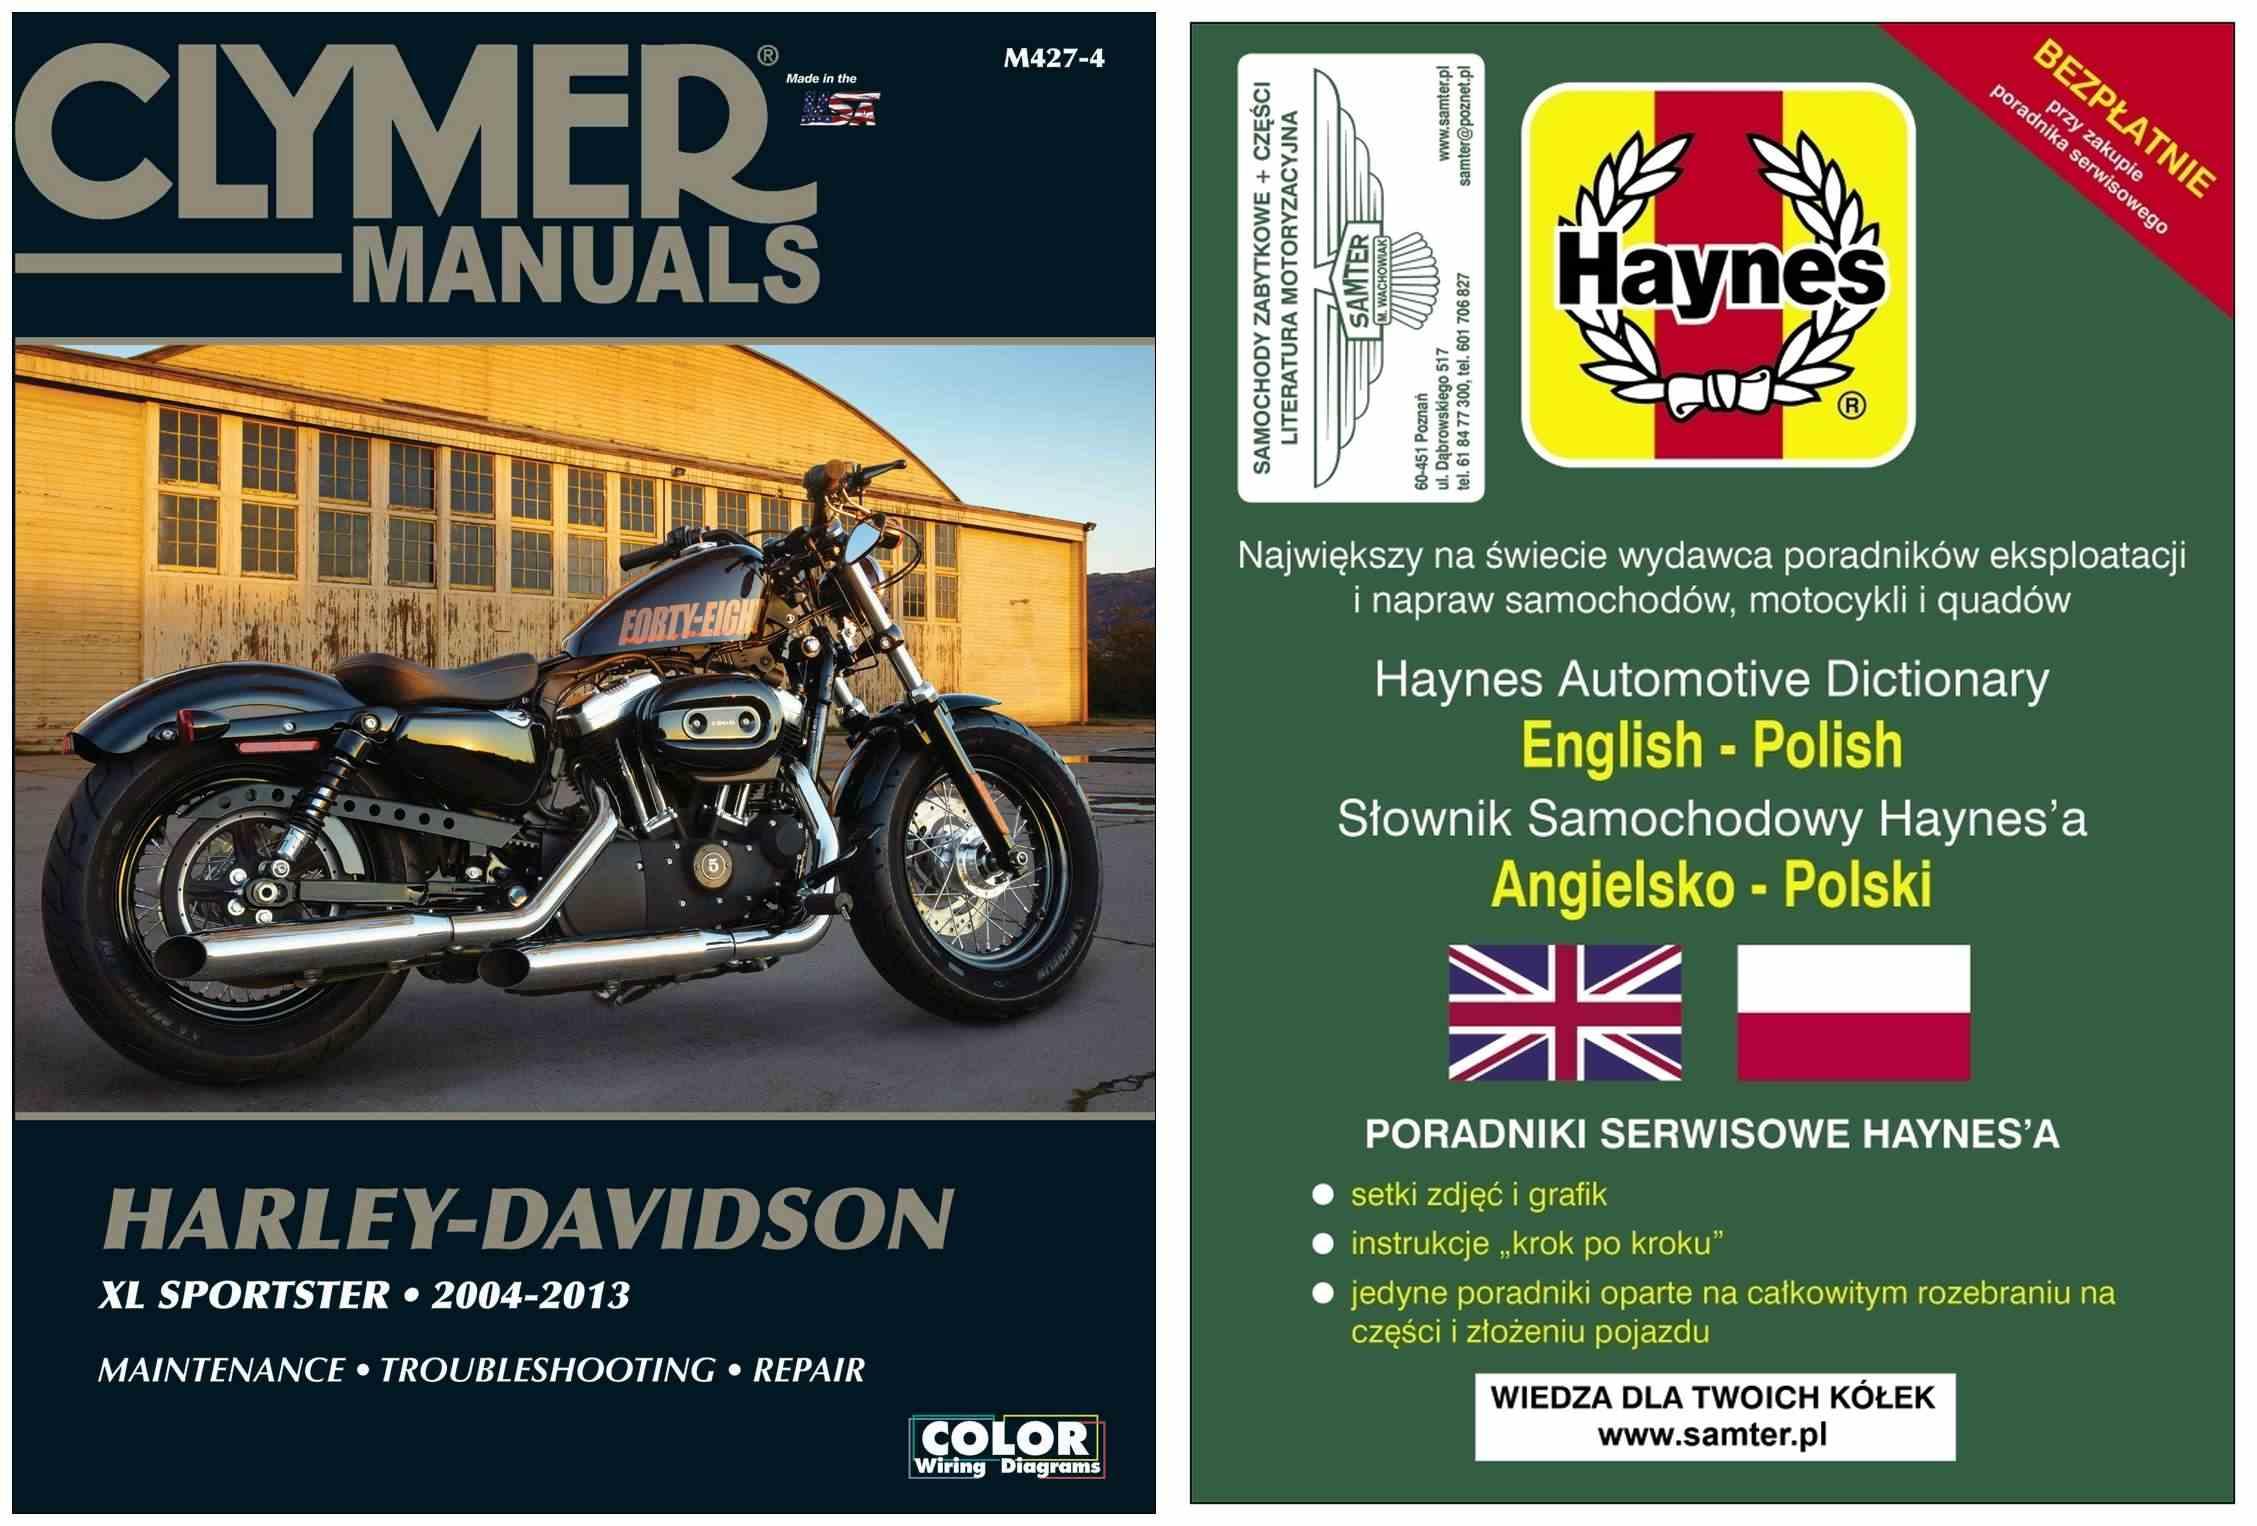 HARLEY-DAVIDSON Sportster 883 1200 2004-13 Clymer